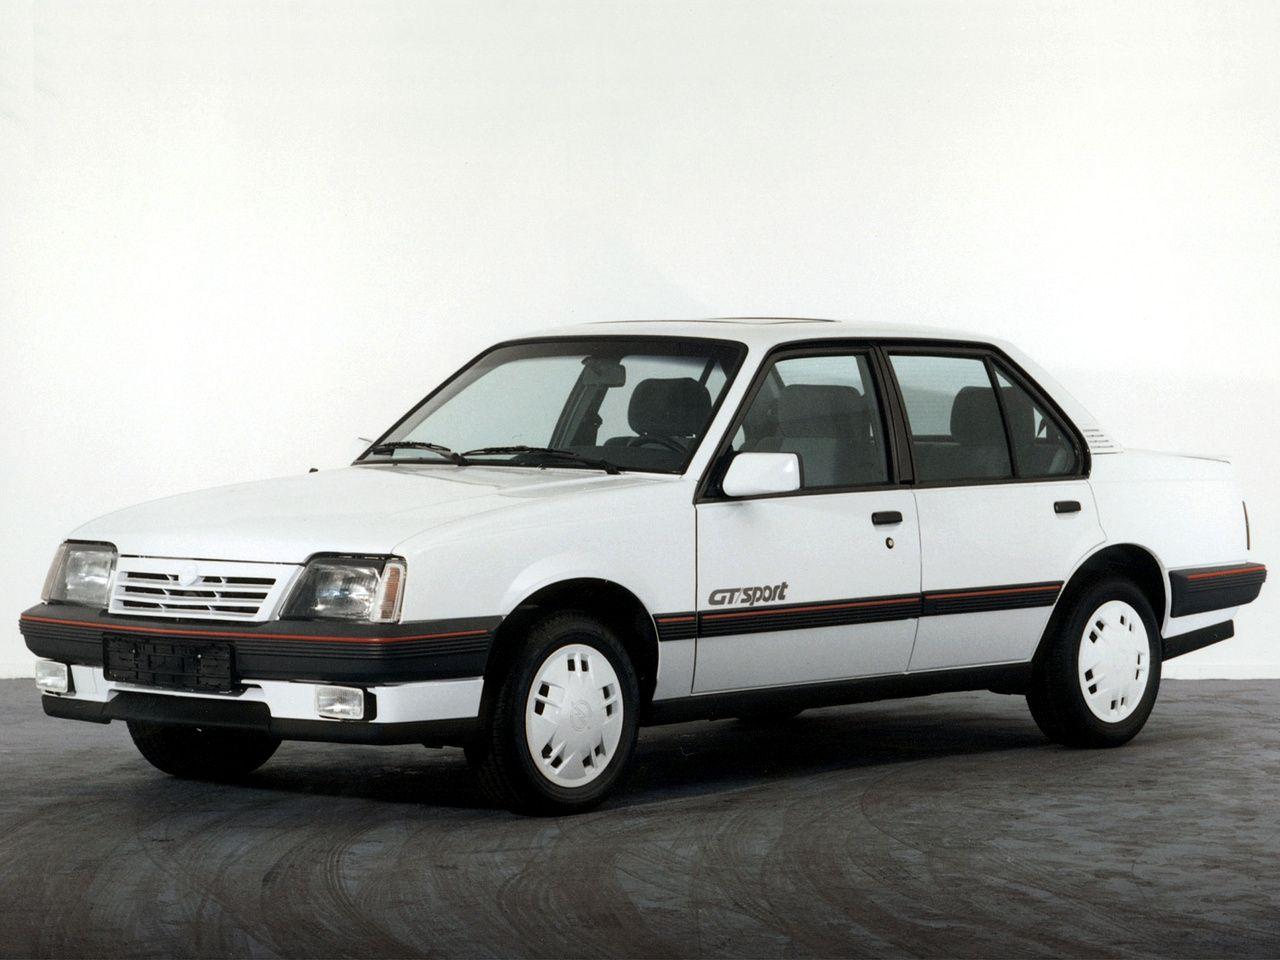 opel ascona c gt sport classic cars vauxhall motors. Black Bedroom Furniture Sets. Home Design Ideas